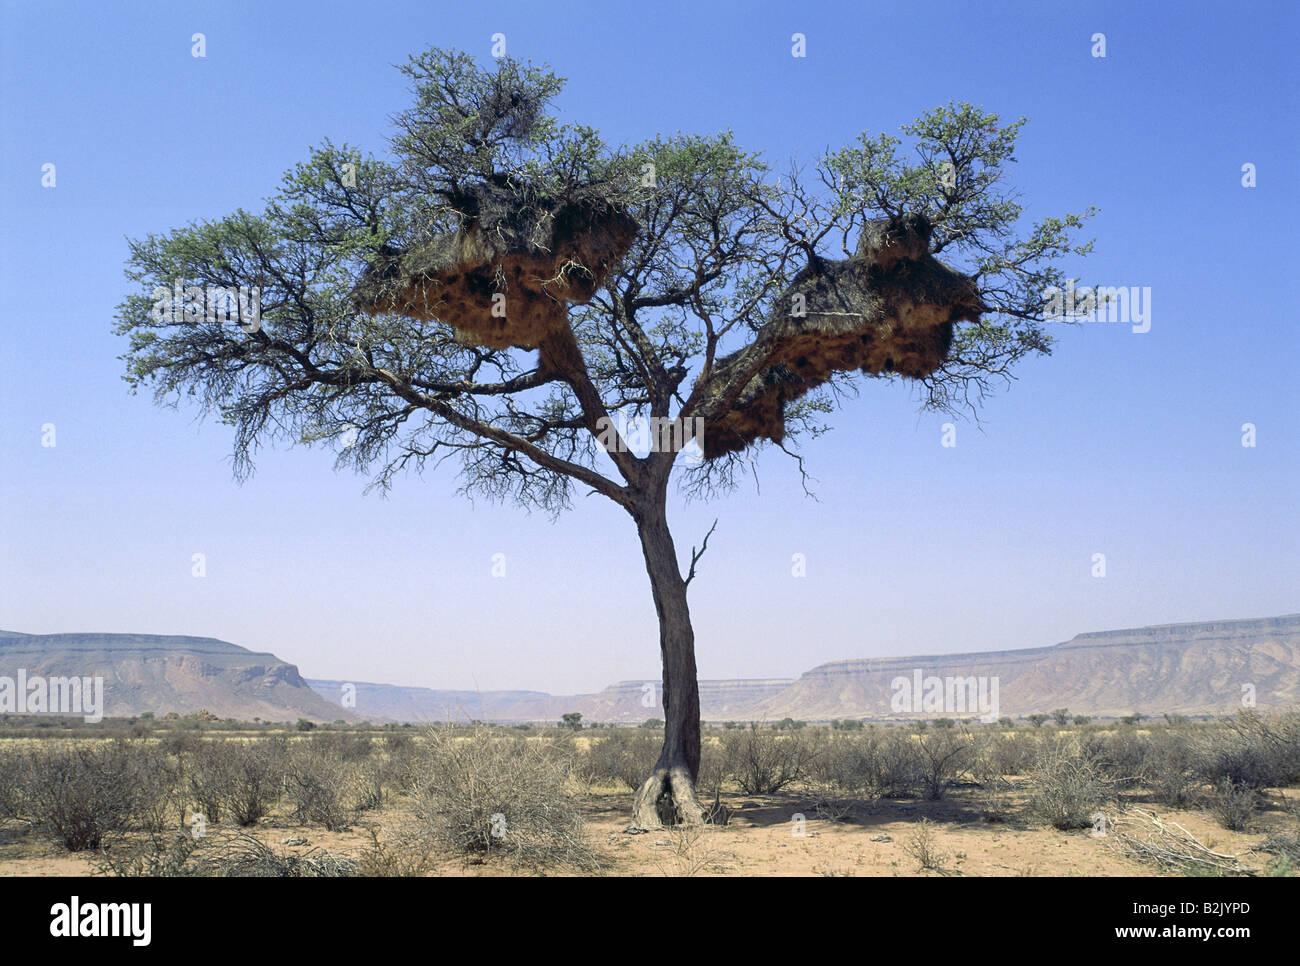 zoology / animals, avian / bird, Widowbirds, (Ploceidae), tree with nests, Namib-Naukluft Park, Namibia, distribution: - Stock Image